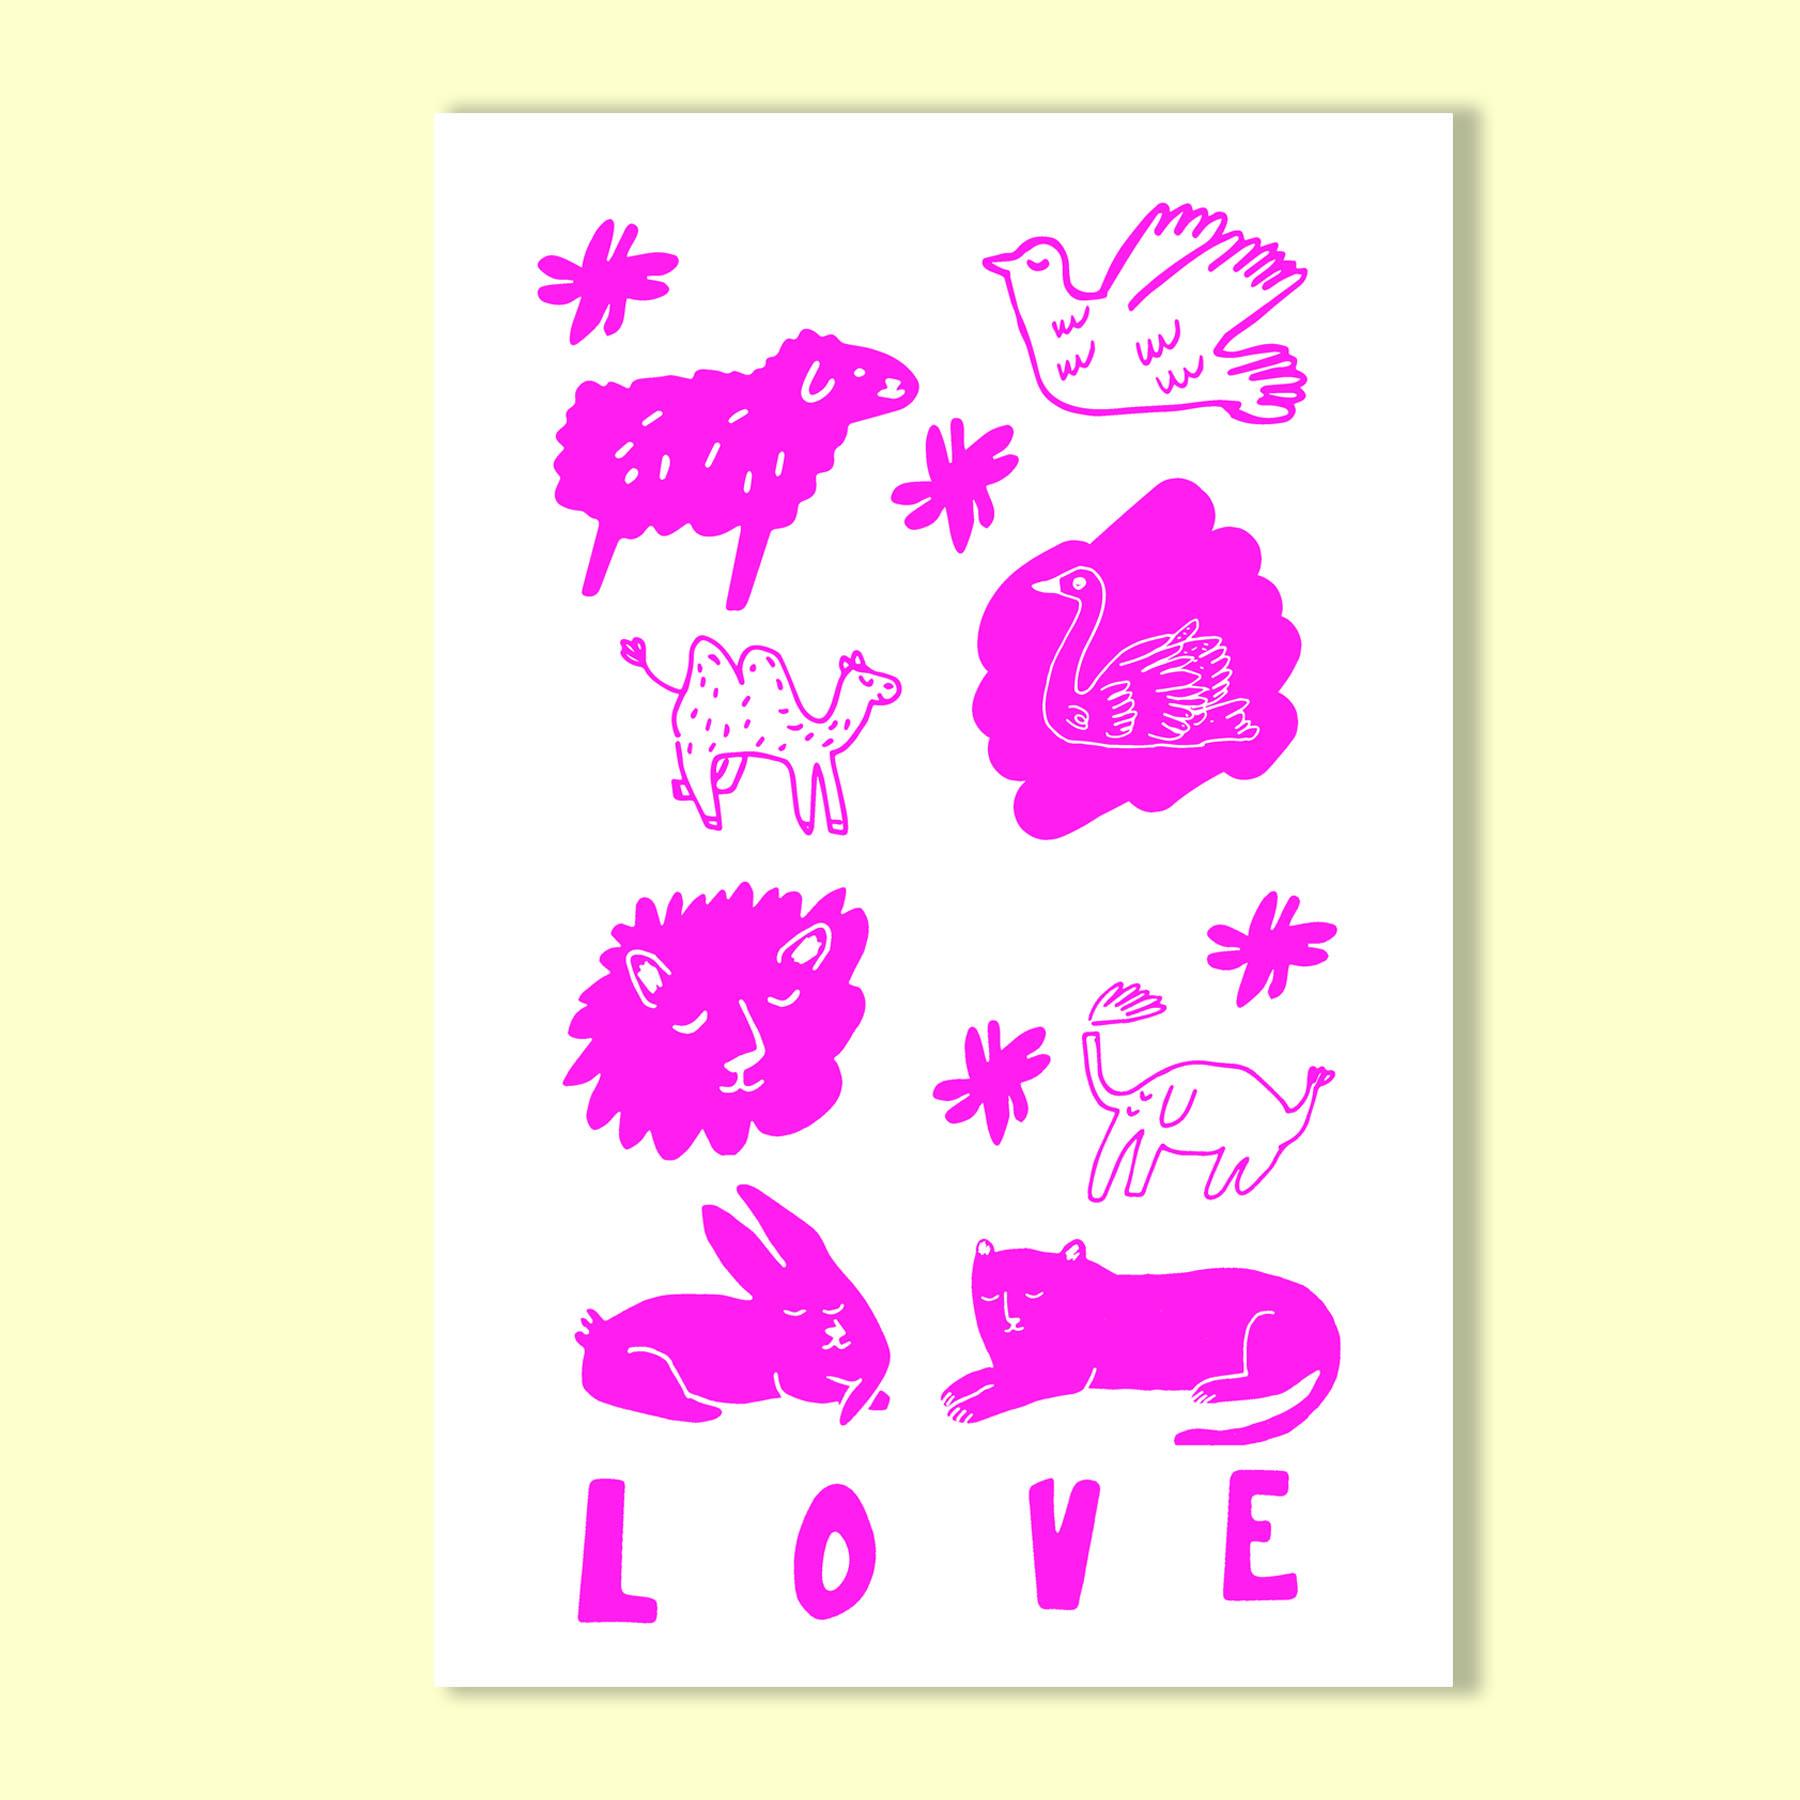 Love 11 X17 Risograph Print $30